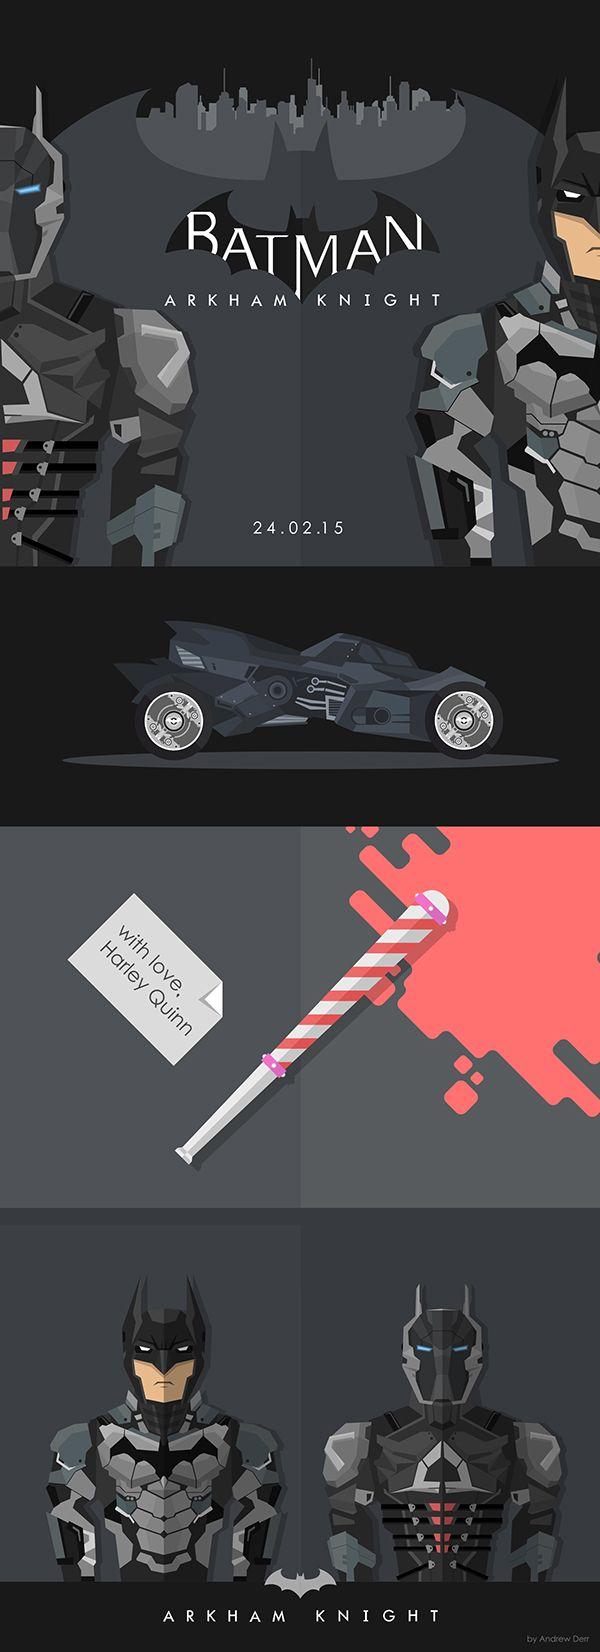 batman arkham knight flat illustration on Behance